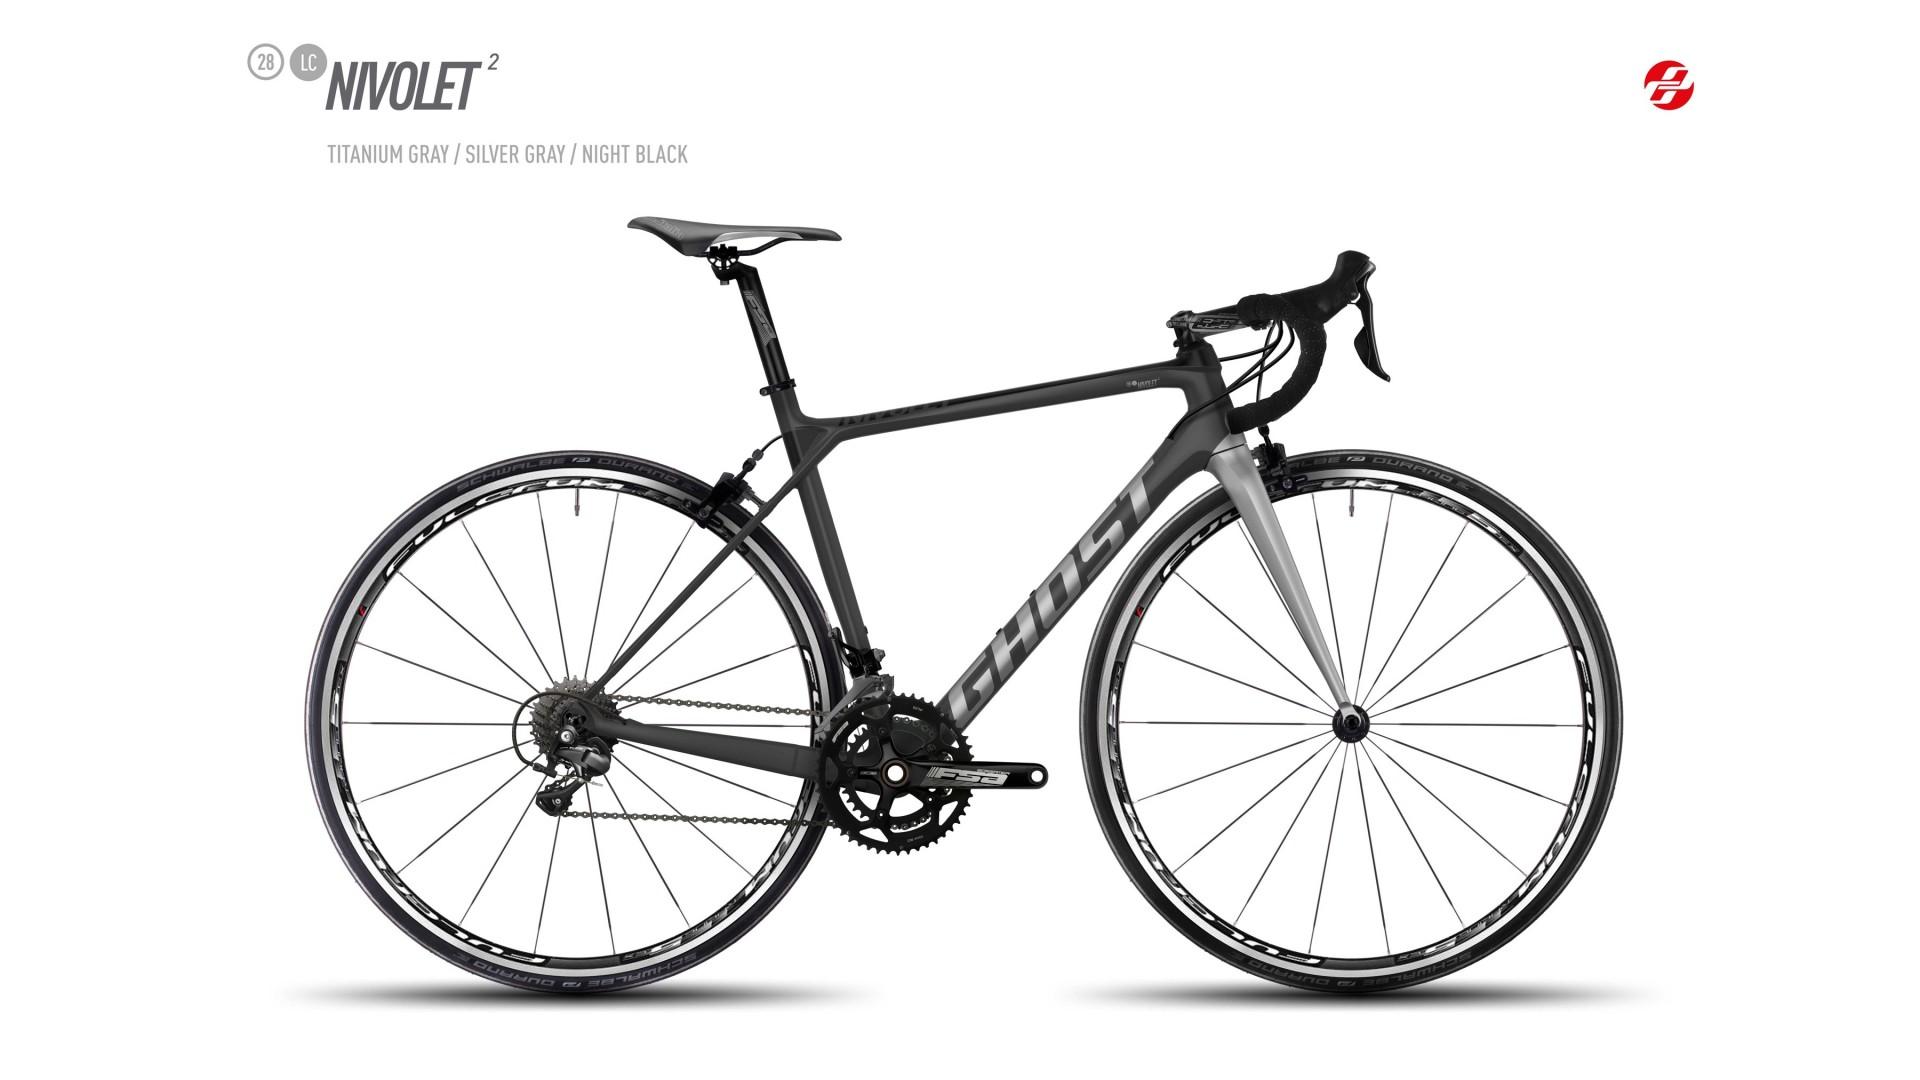 Велосипед GHOST Nivolet 2 LC 28 titaniumgrey/silvergrey/nightblack год 2017